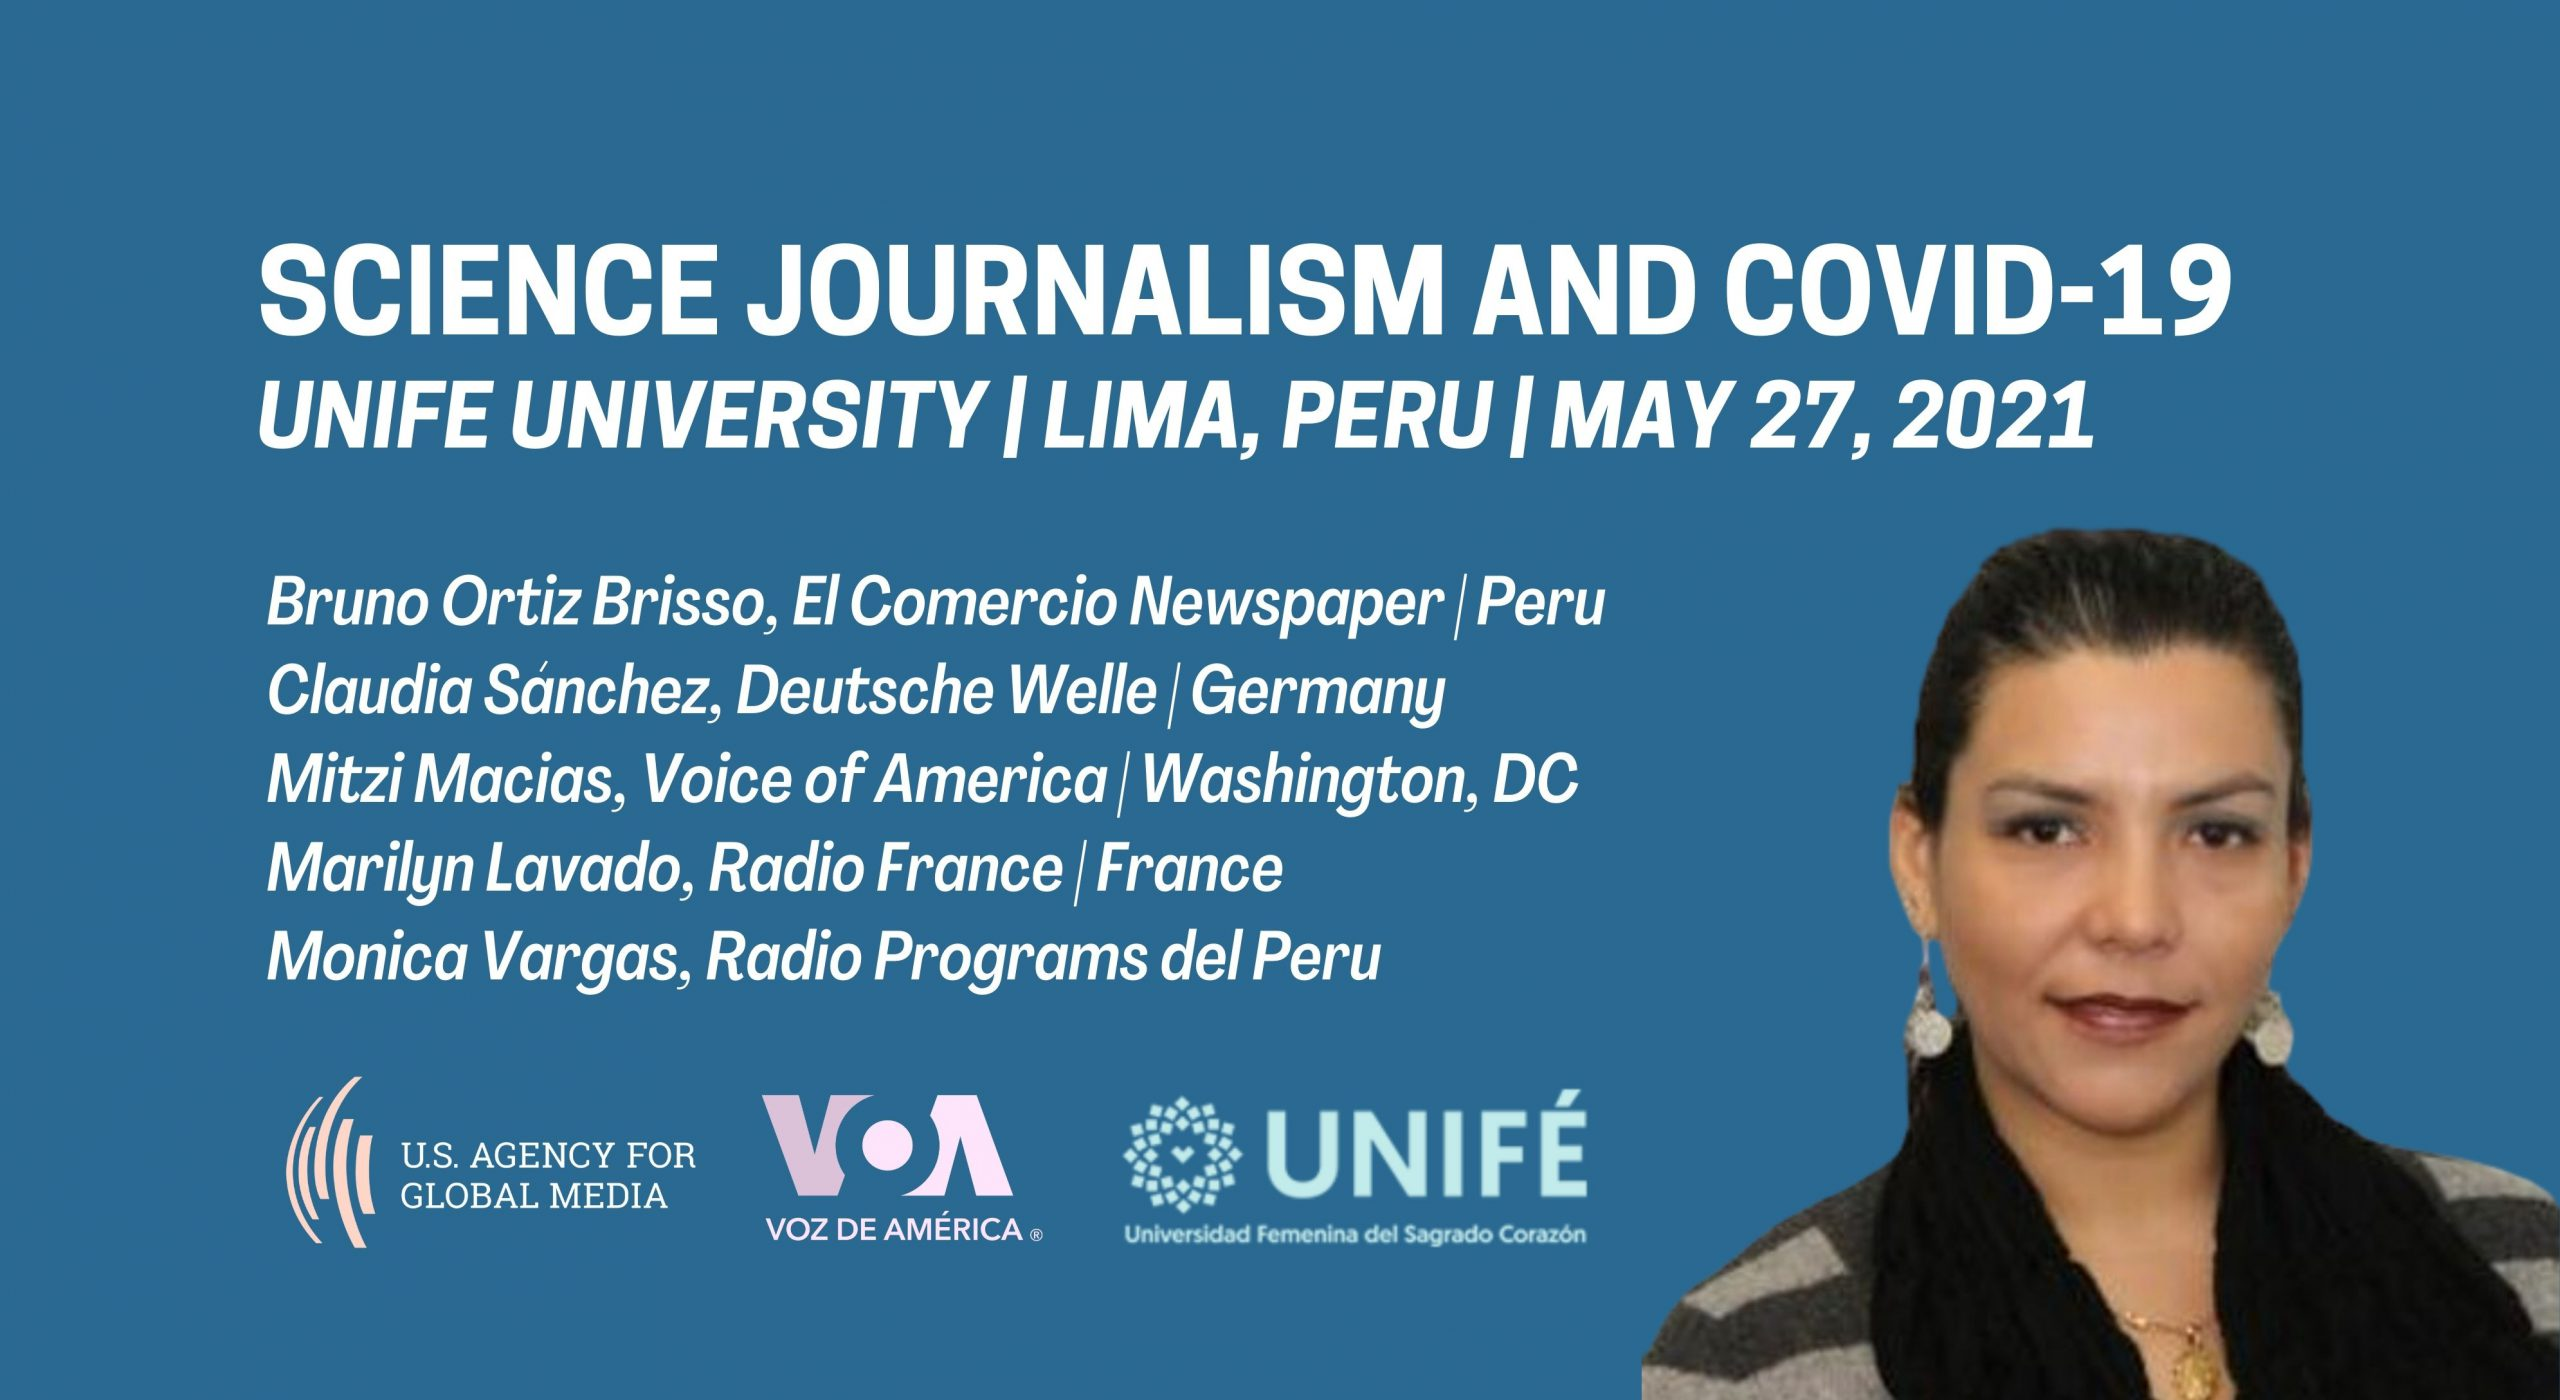 Peru: Science Journalism and COVID-19